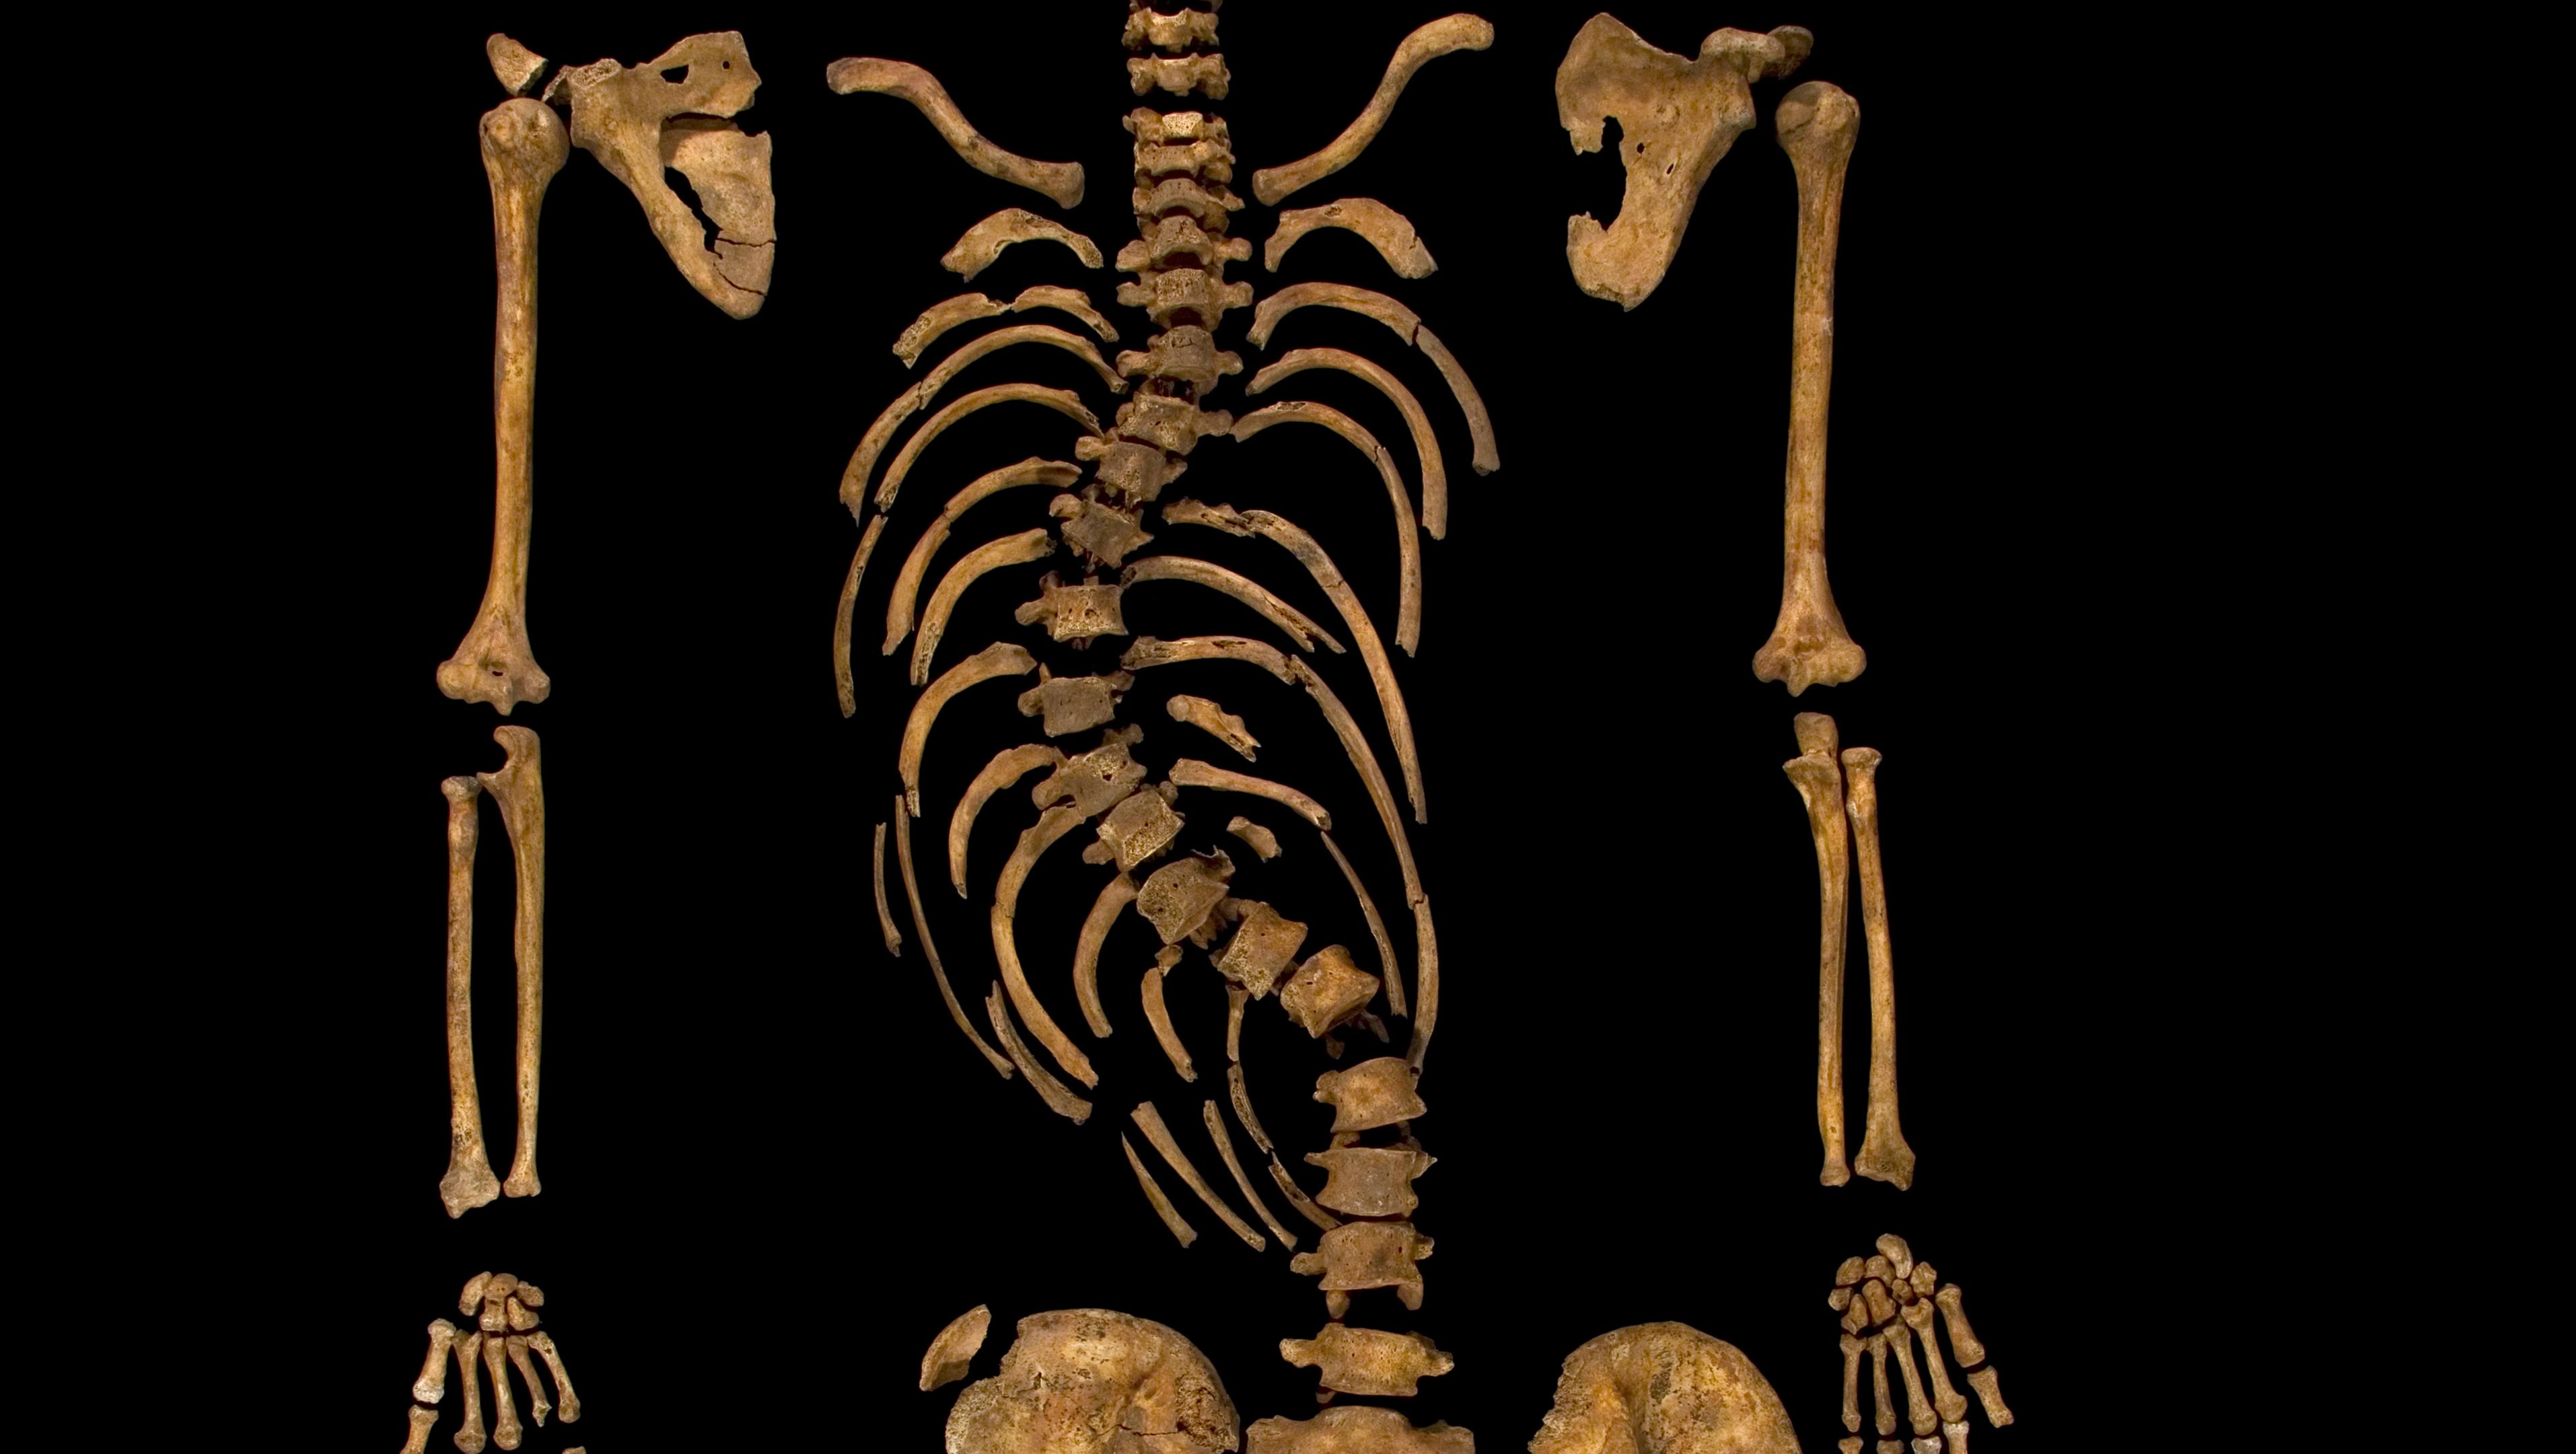 3d visualization sheds light on richard iiis spinal